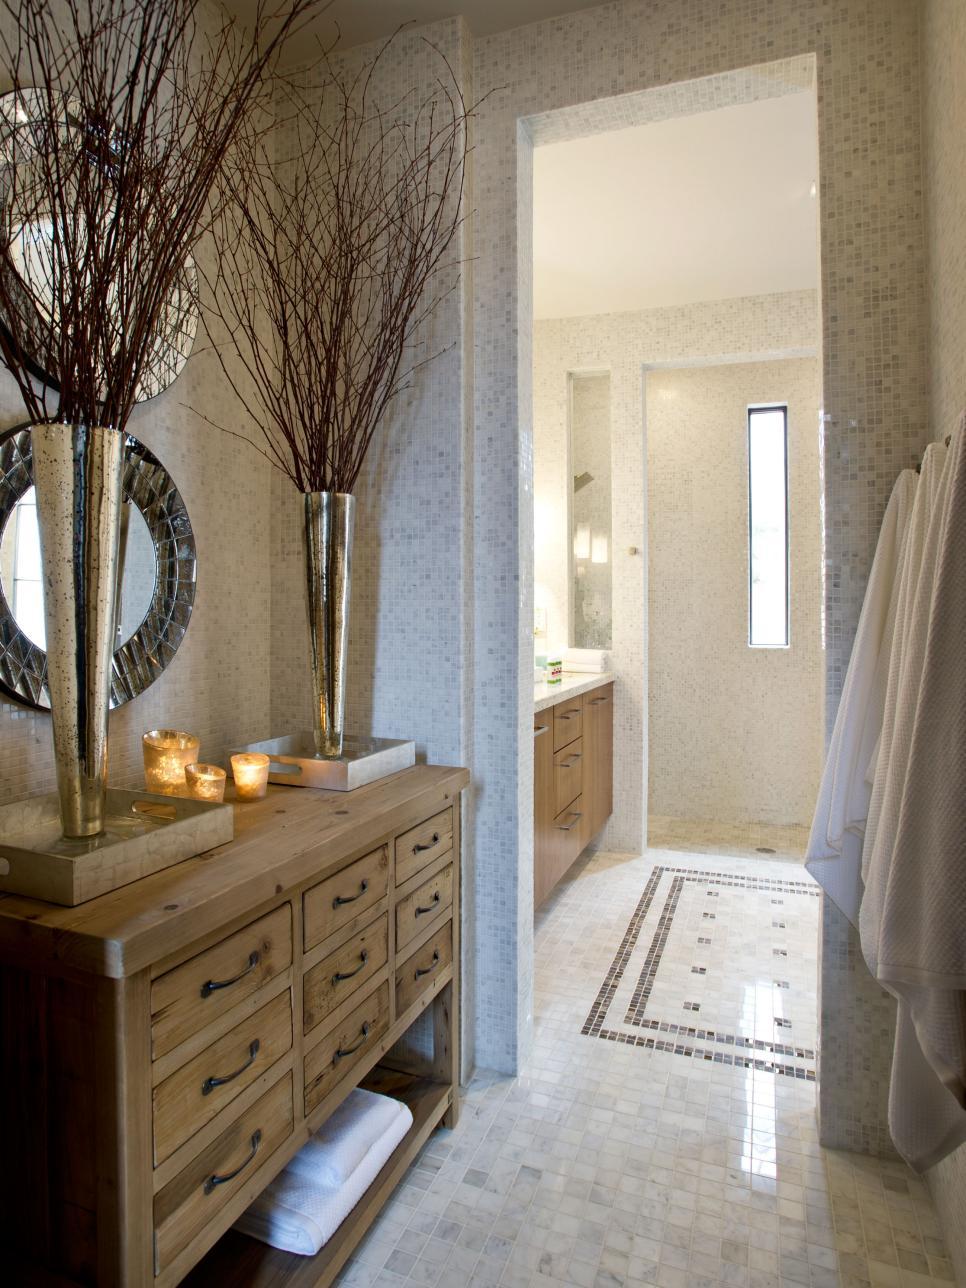 Master Bathroom Green hgtv green home 2012: master bathroom pictures   hgtv green home